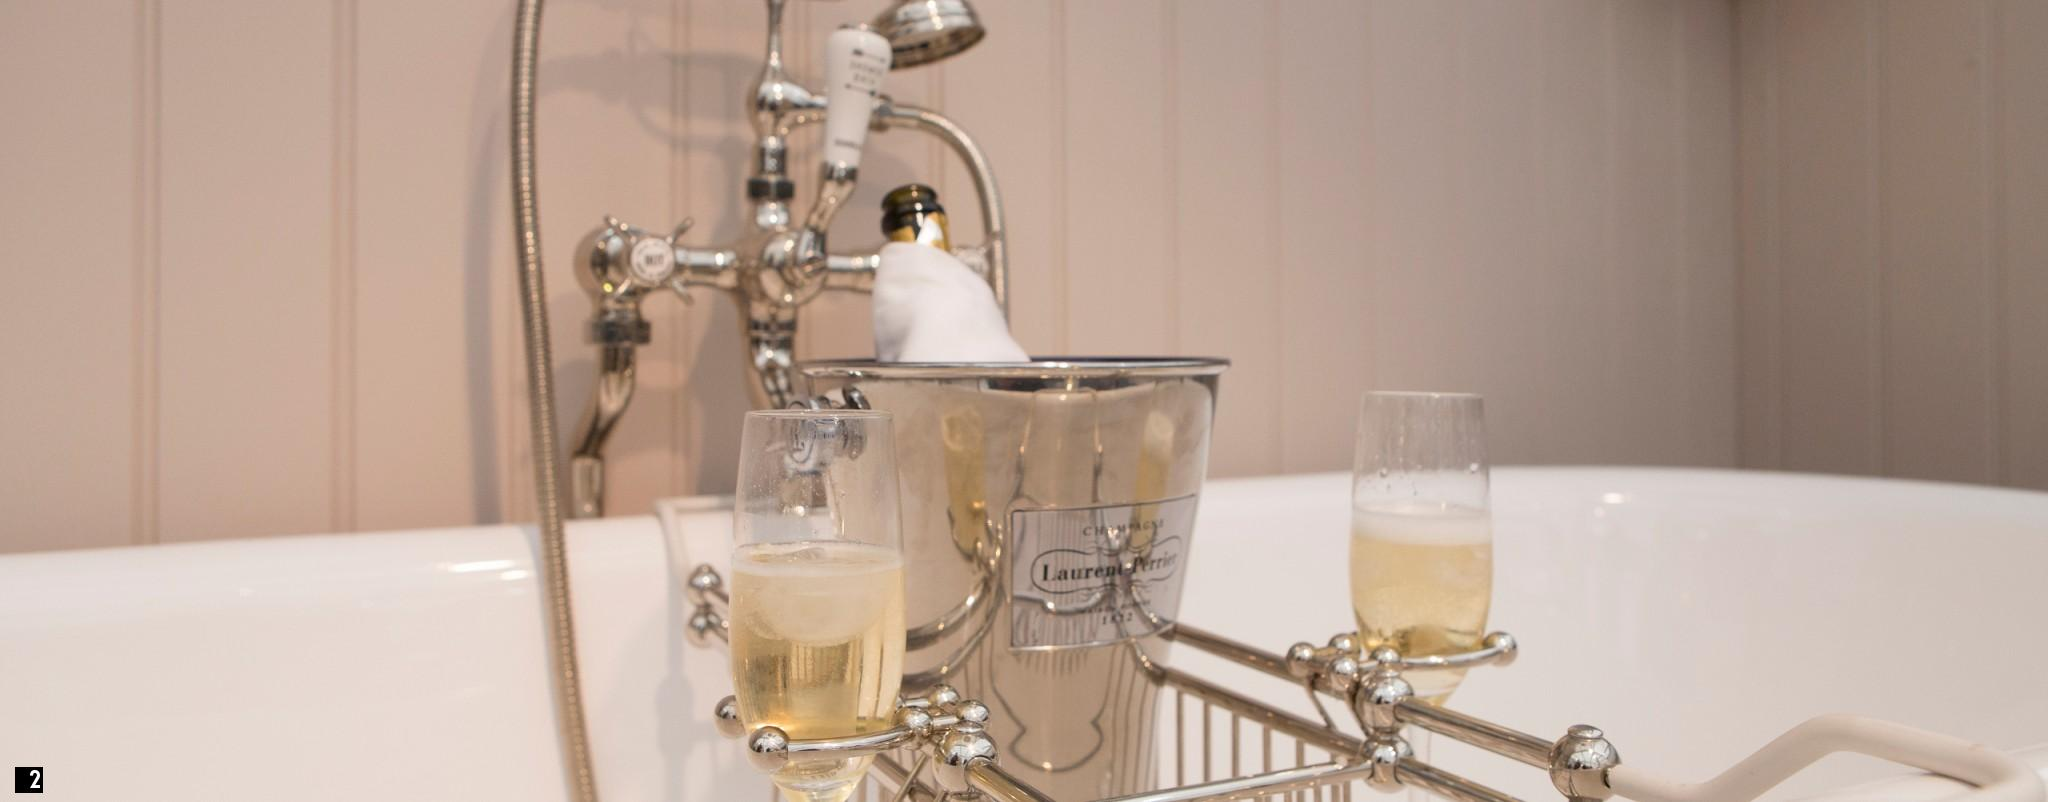 chadder luxury bathroom accessories - bath rack